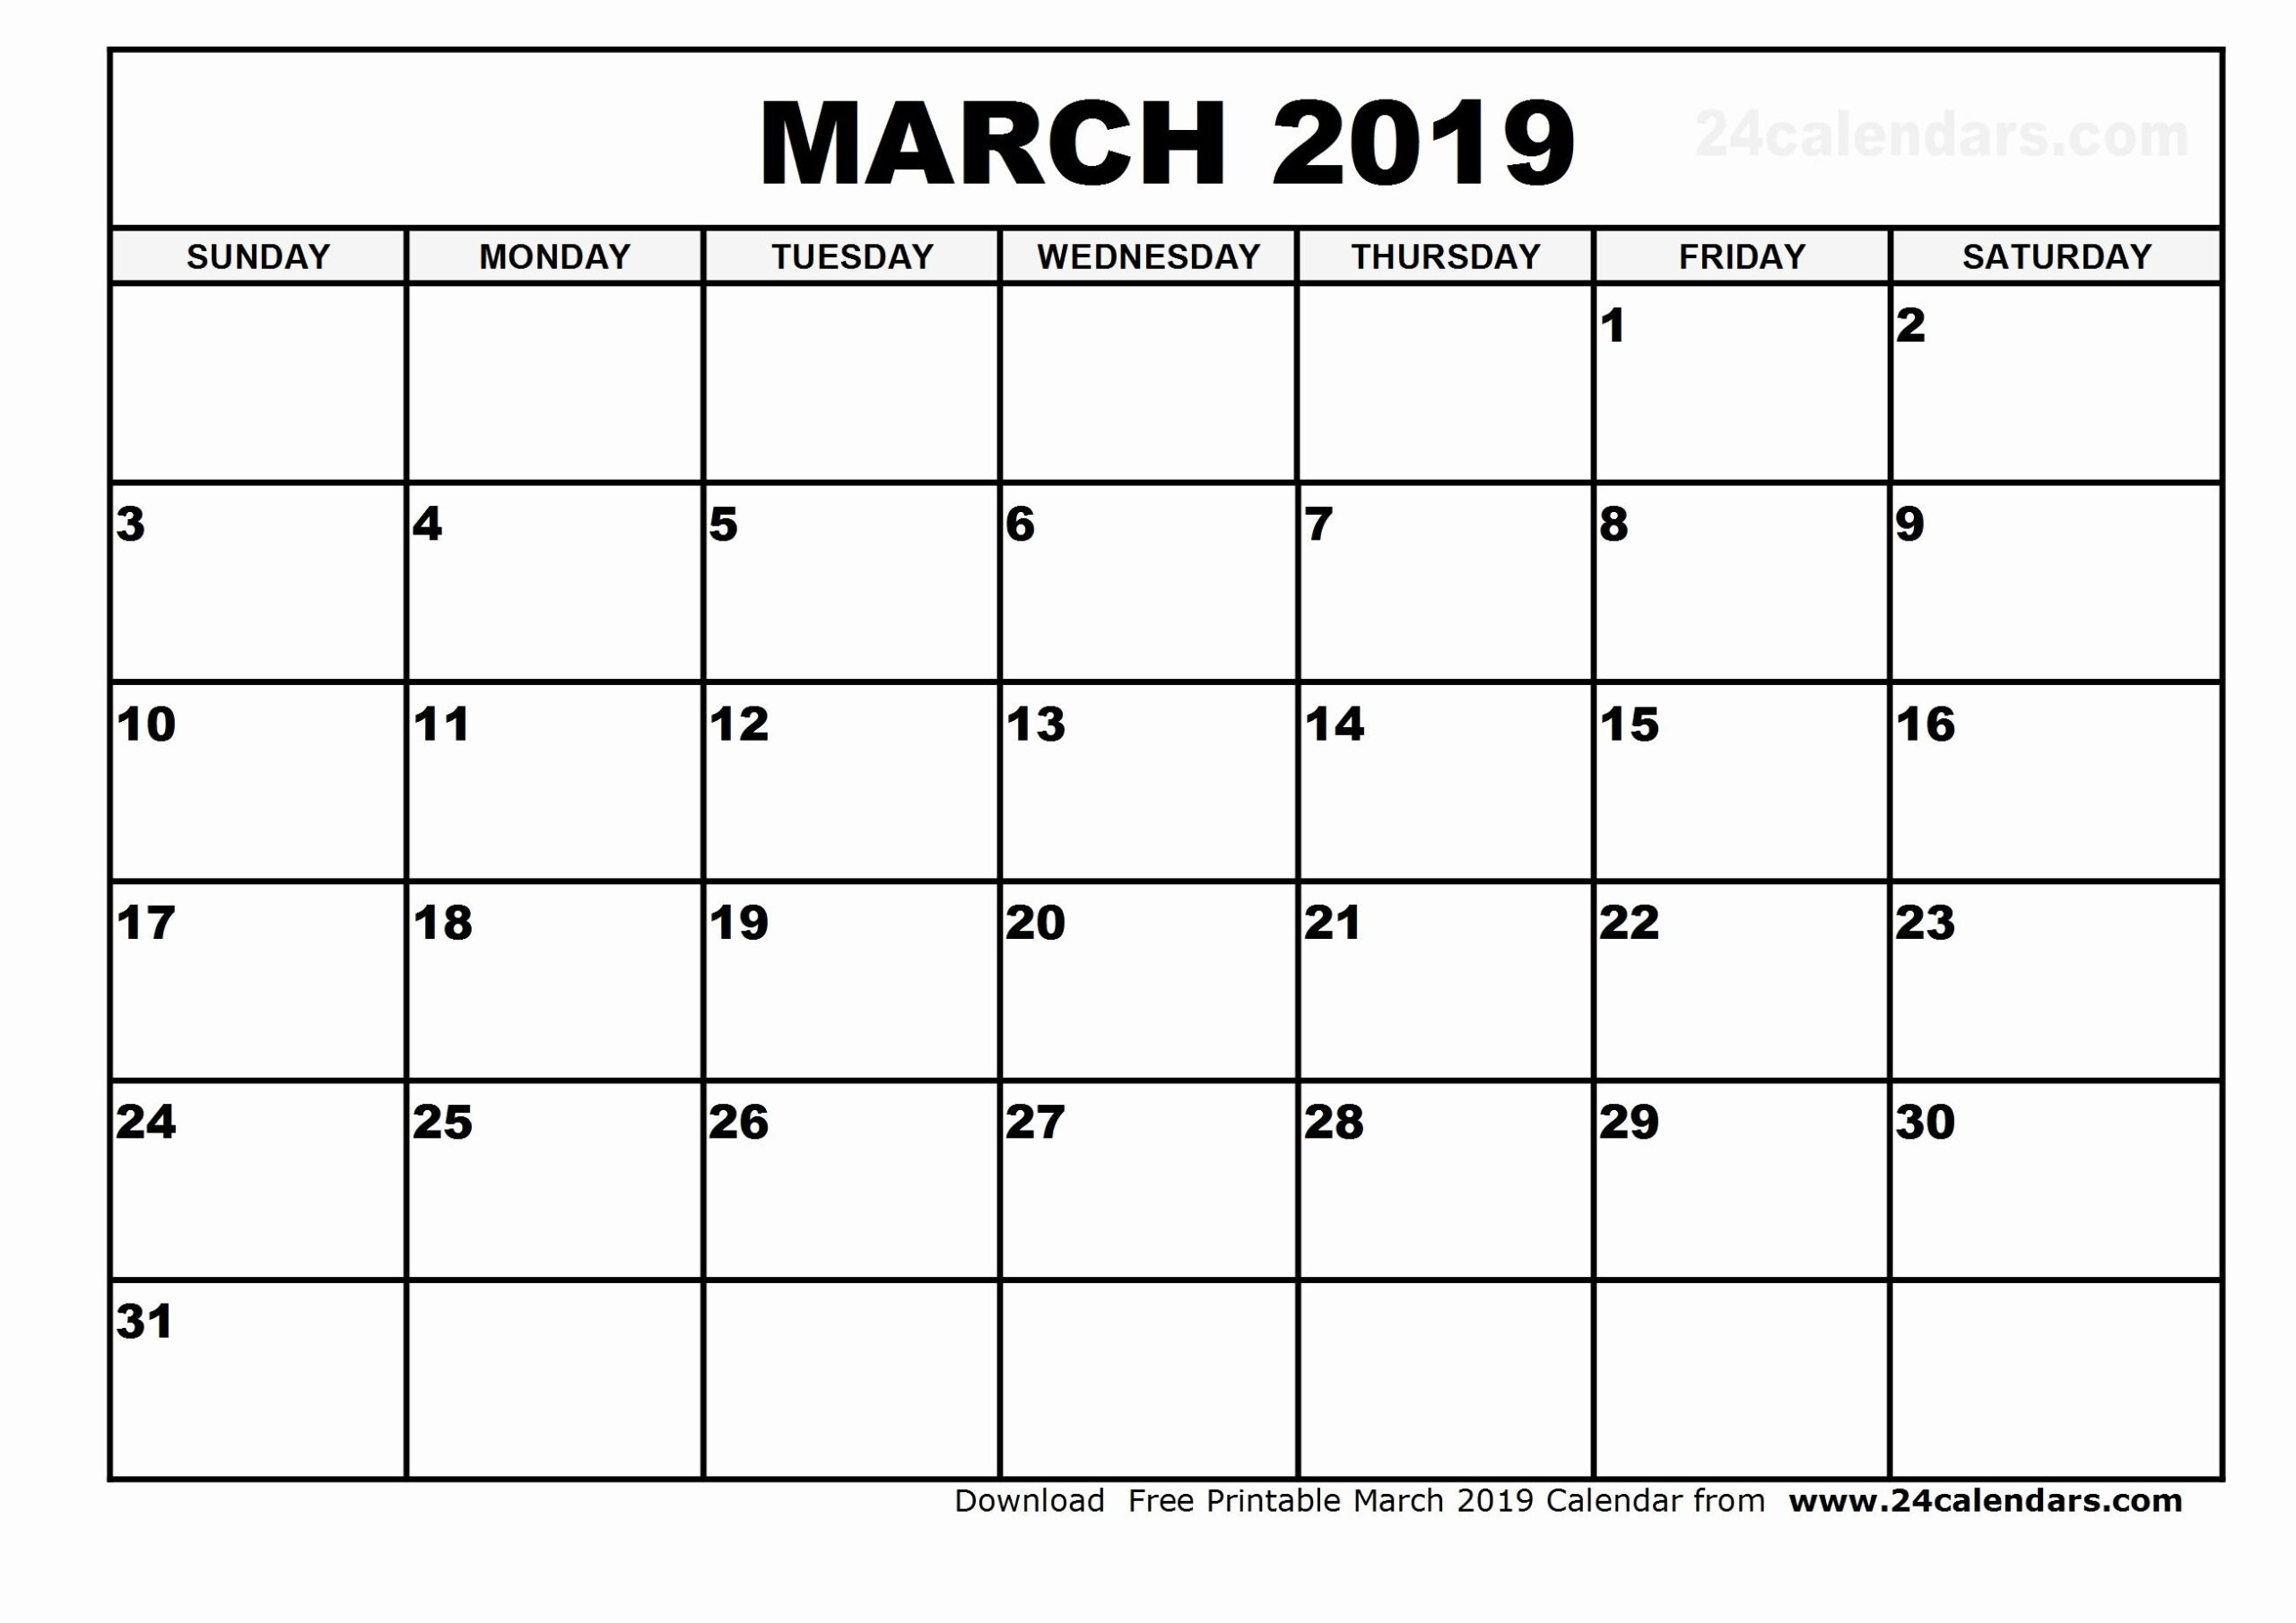 Free Printable Calendar 4 Month In 2020 | Calendar regarding Free Printable 4 Month Calendar